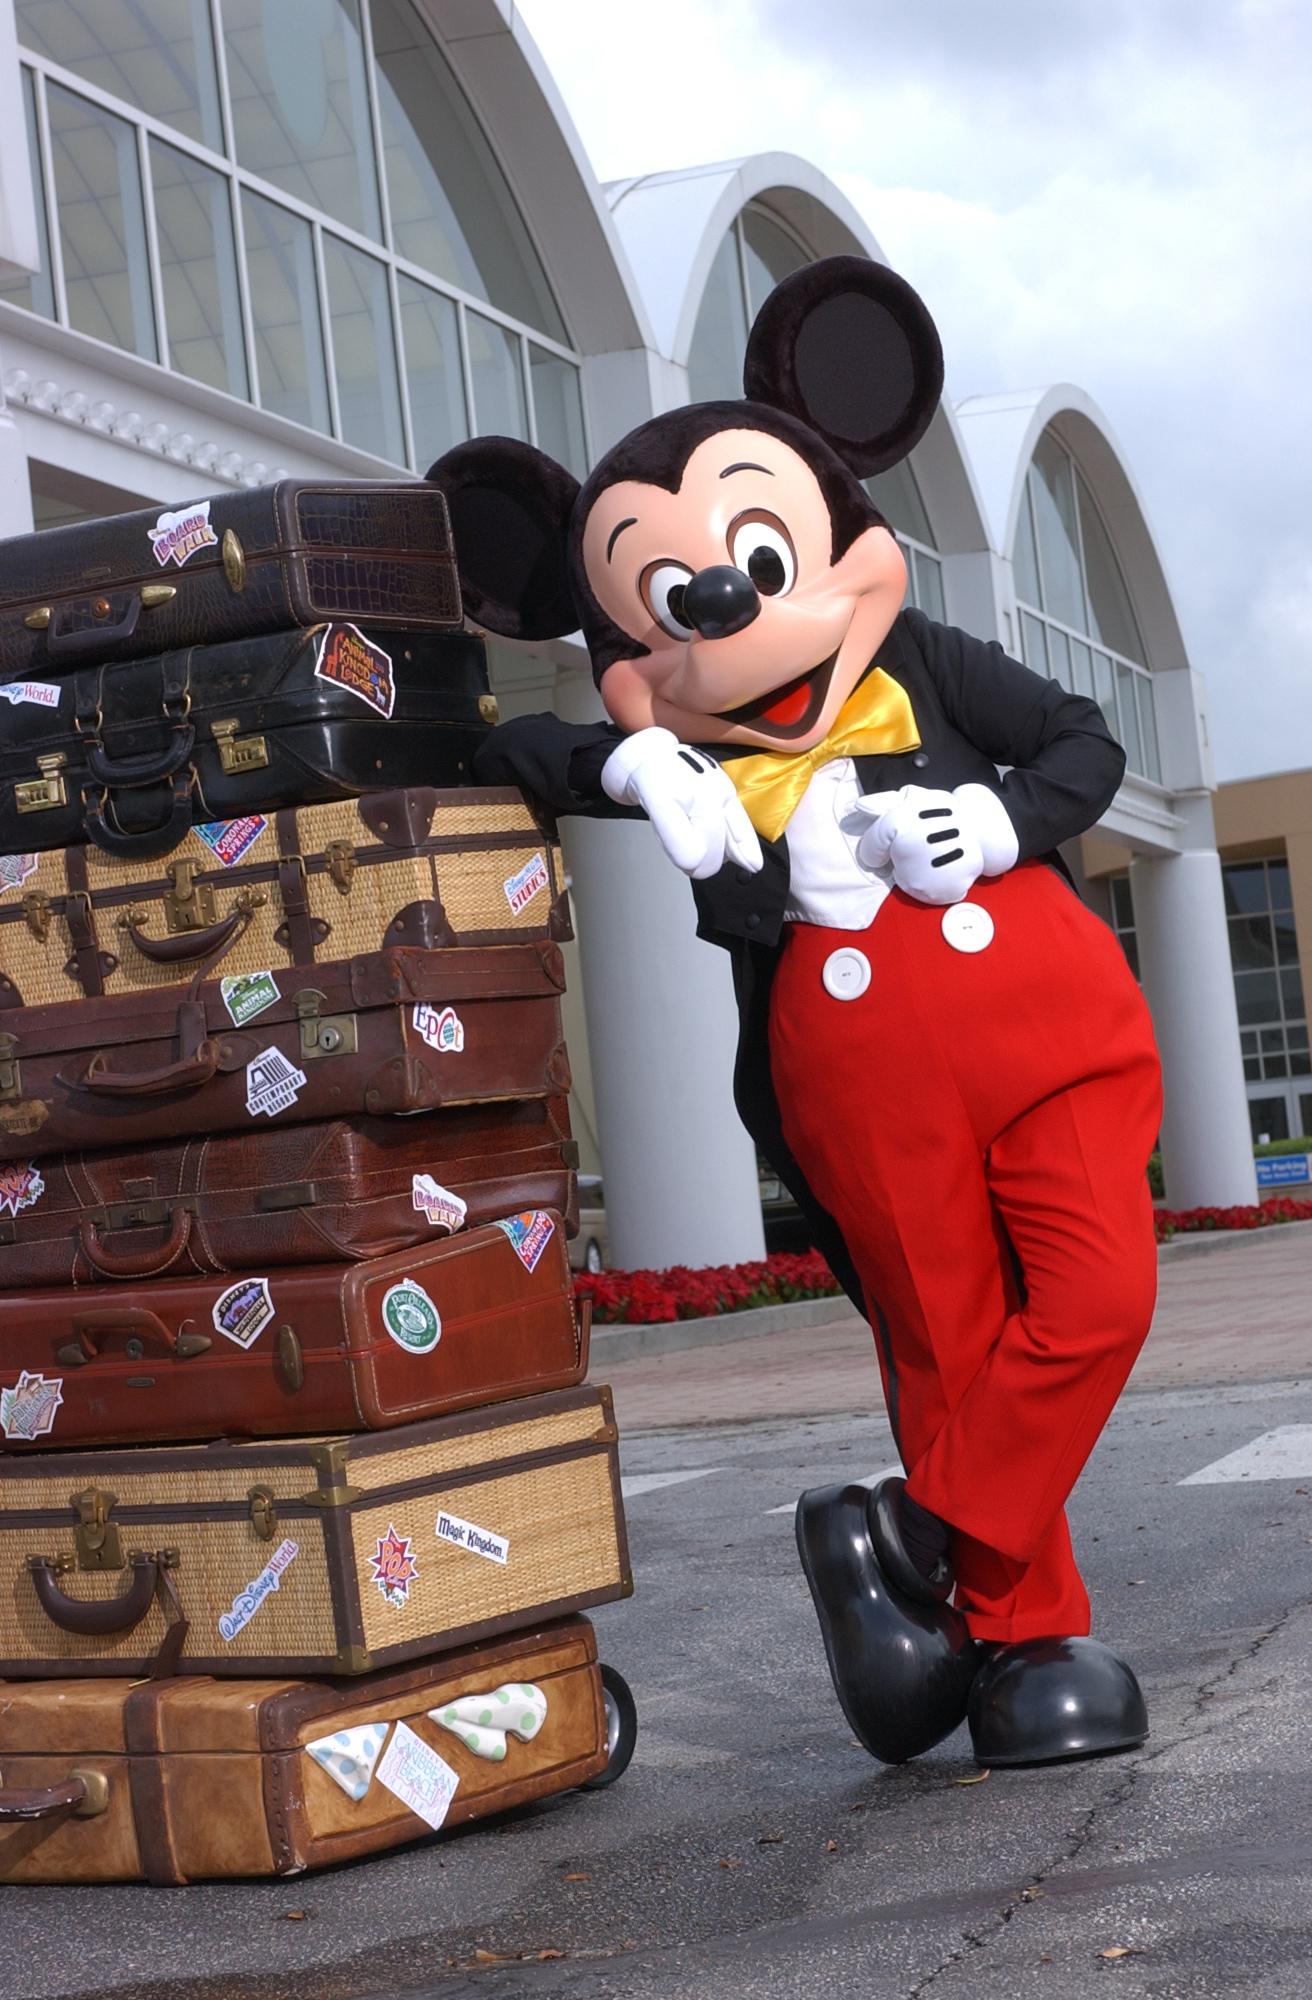 Disney Magical Express / Walt Disney World